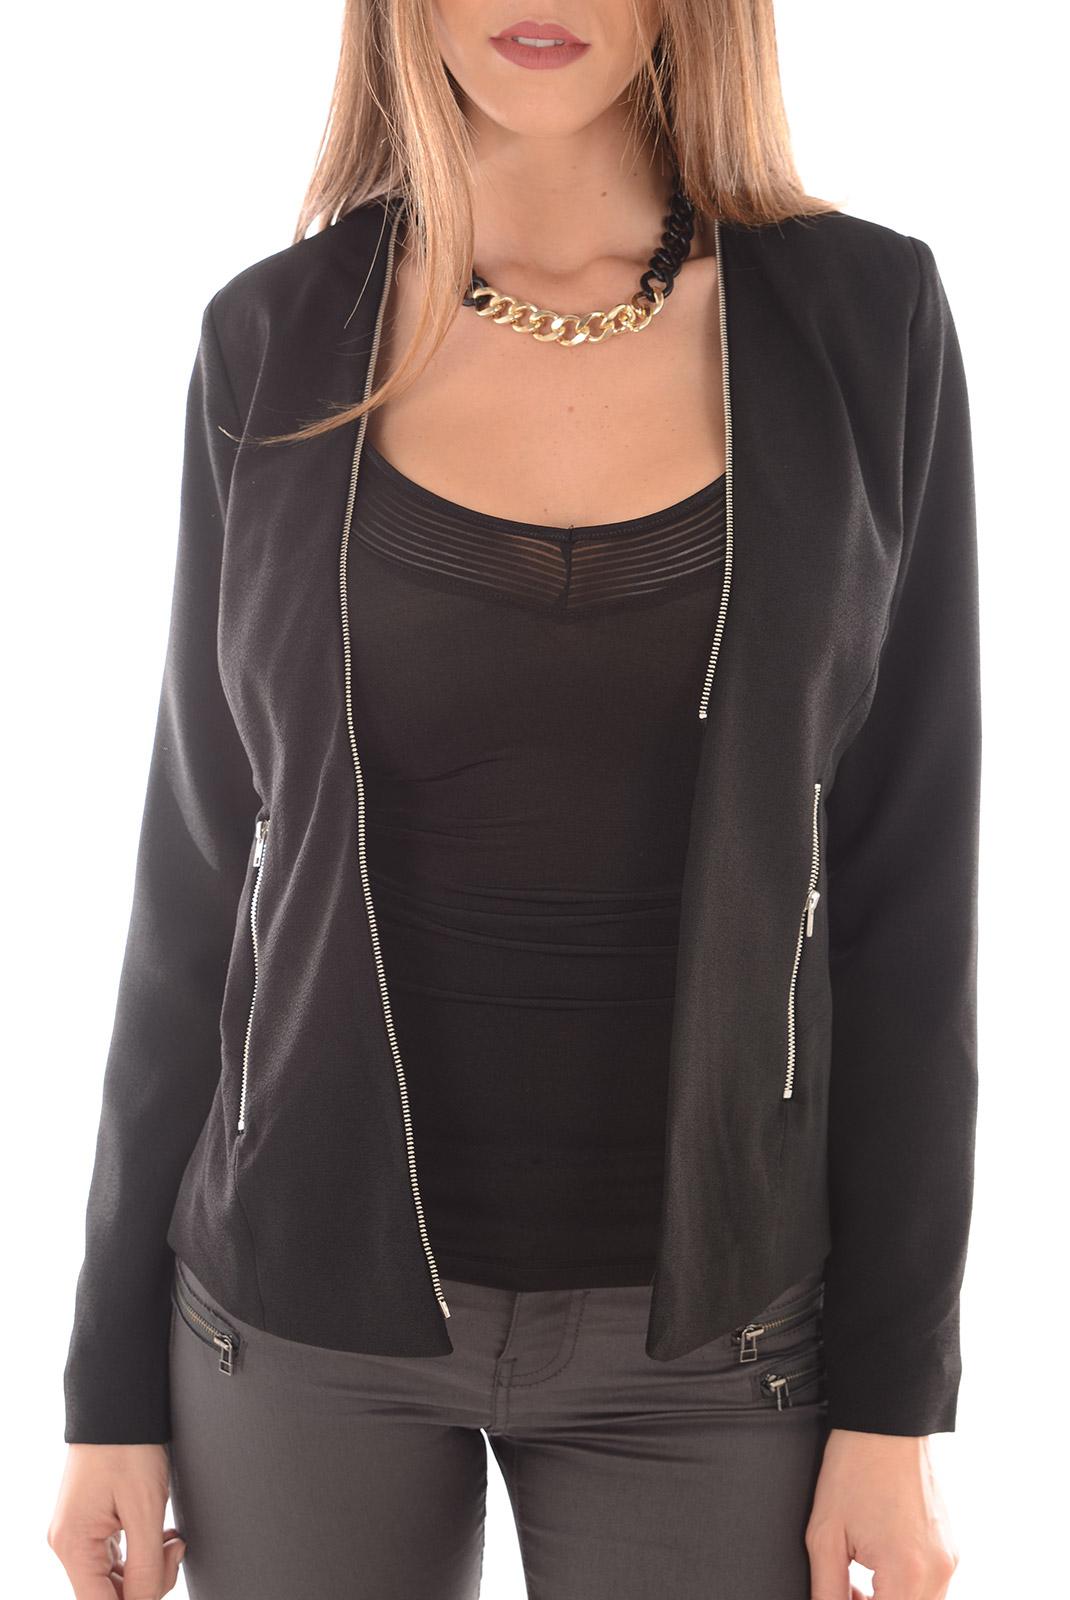 Vestes & blousons  Vero moda MARIANNE LS LOOSE BLAZER BLACK